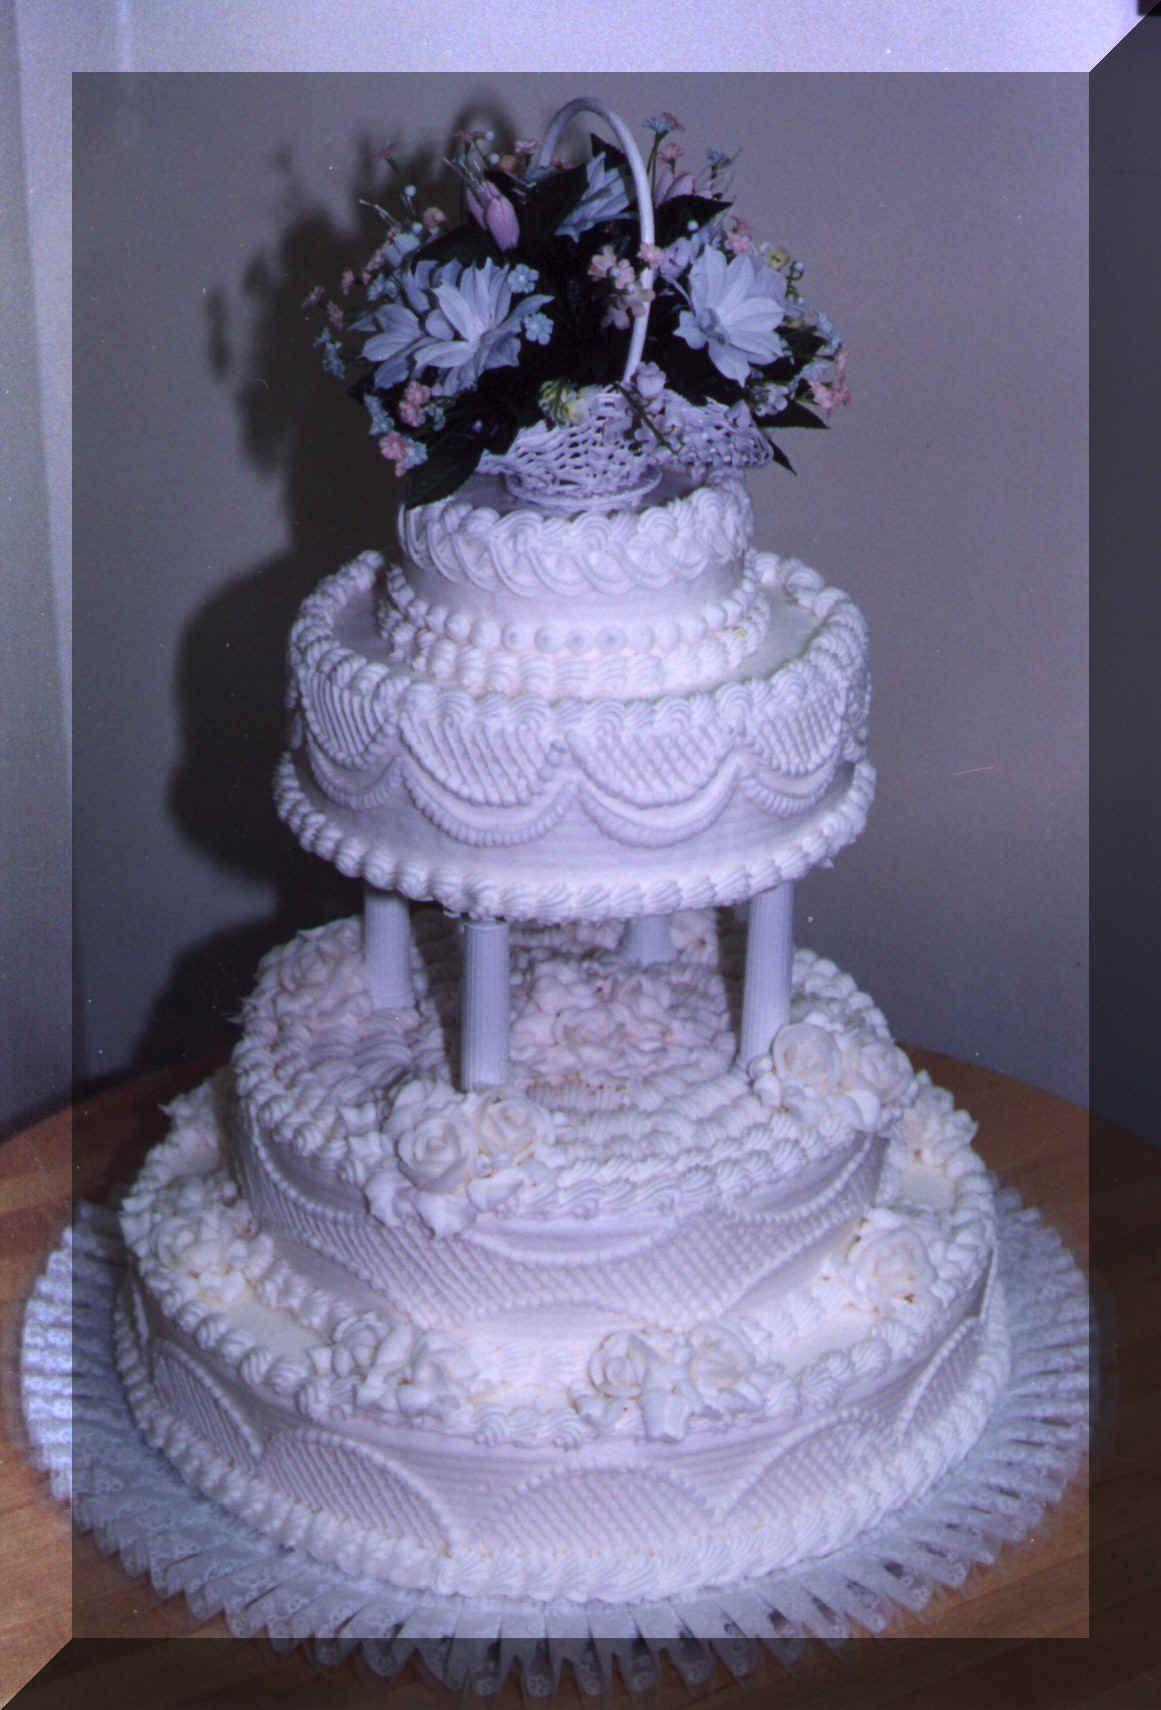 walmart wedding cakes prices wedding cakes by hofer 39 s